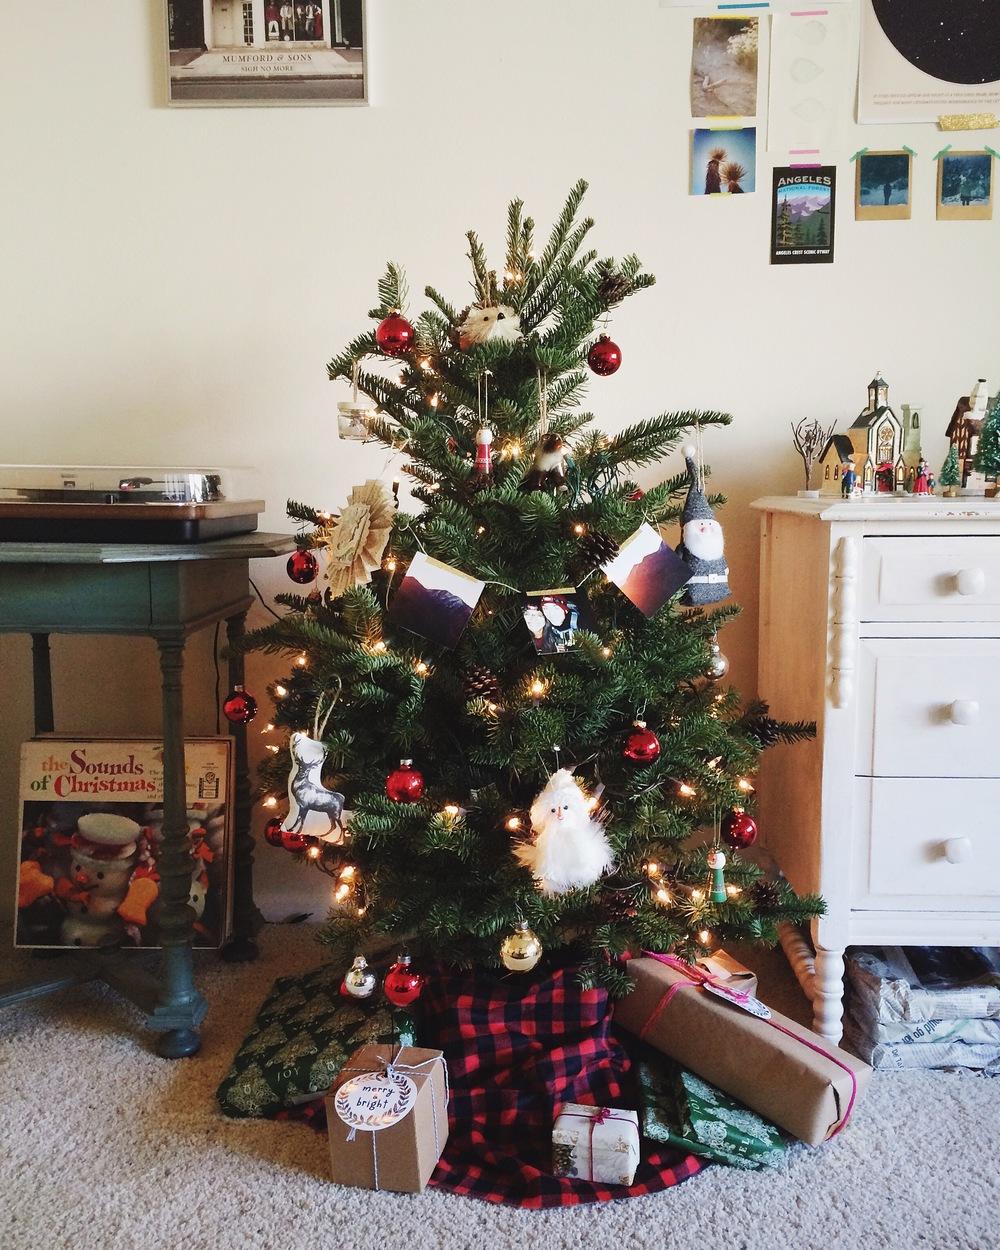 Photo Dec 13, 2 06 35 PM.jpg